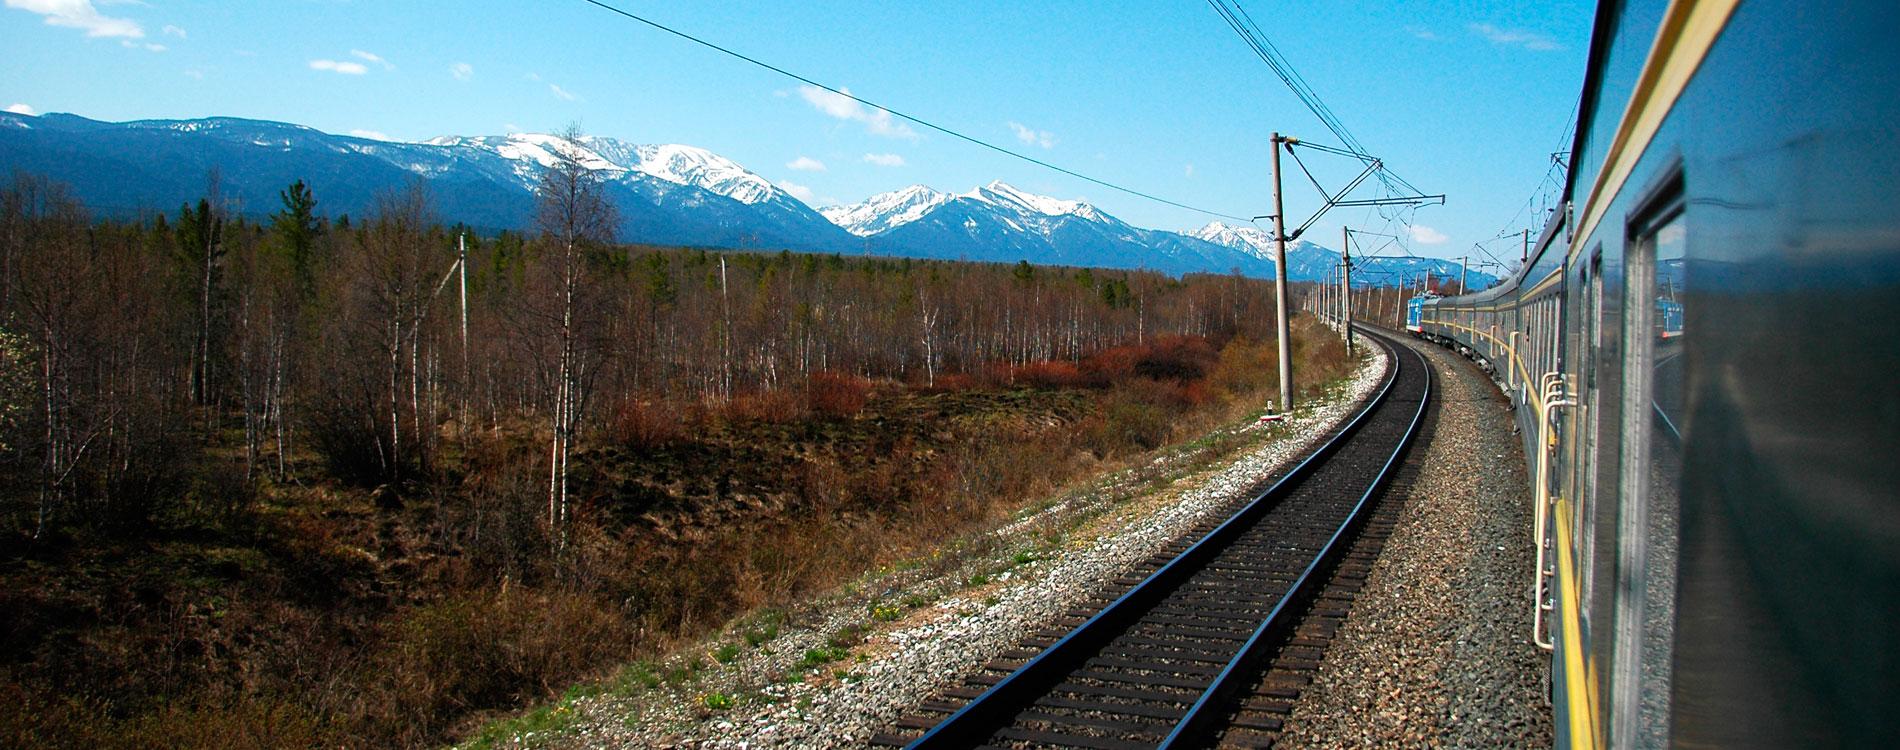 Фото поезд москва-владивосток 4